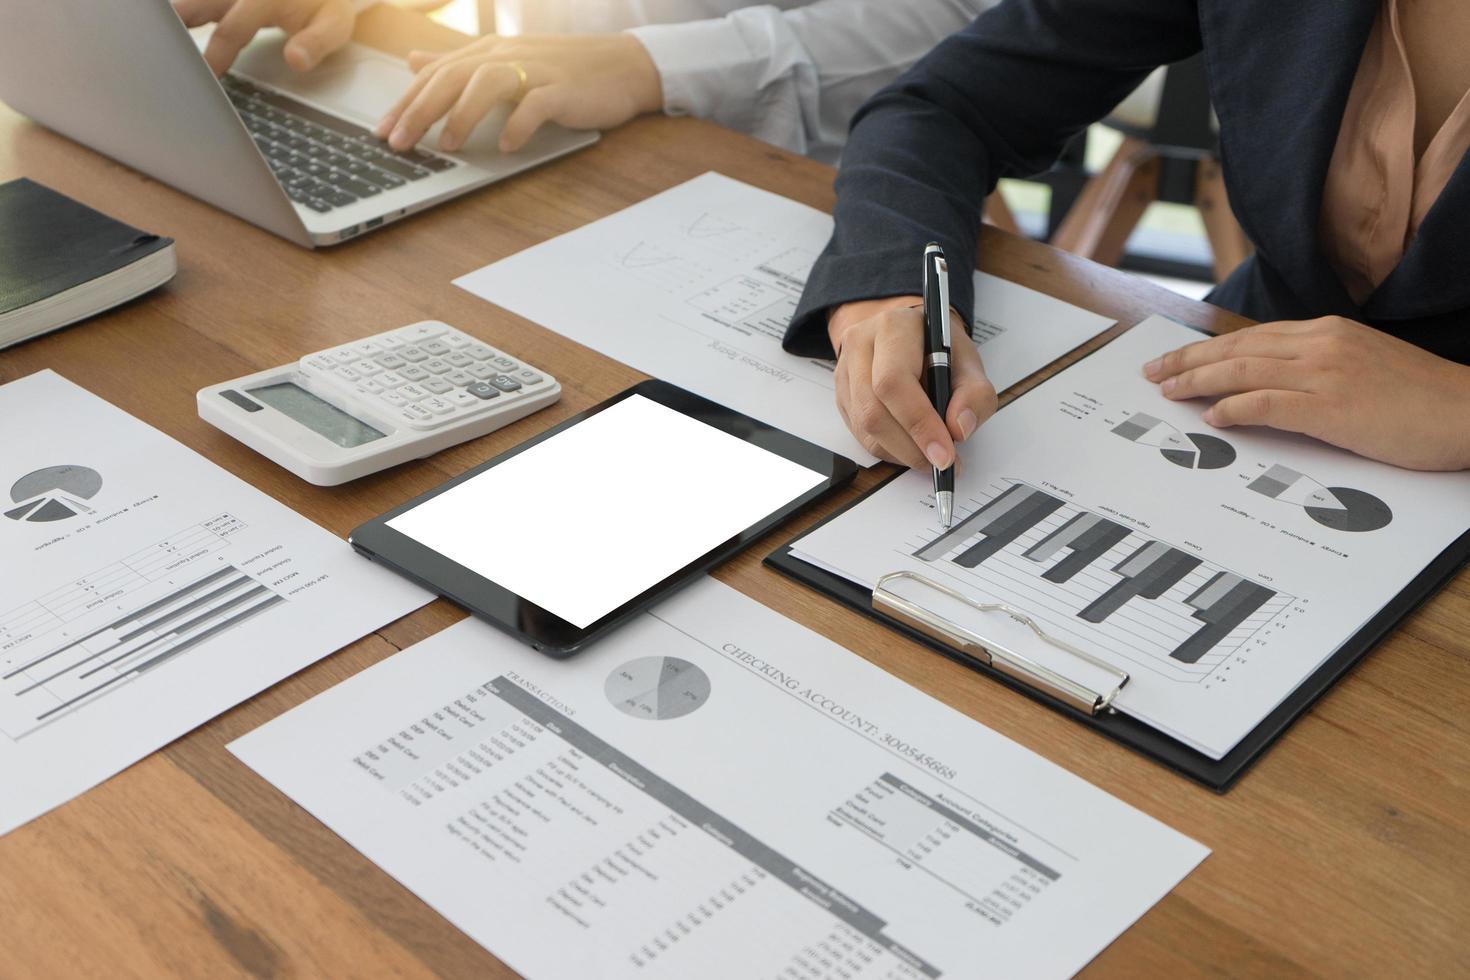 Business tablet mockup photo